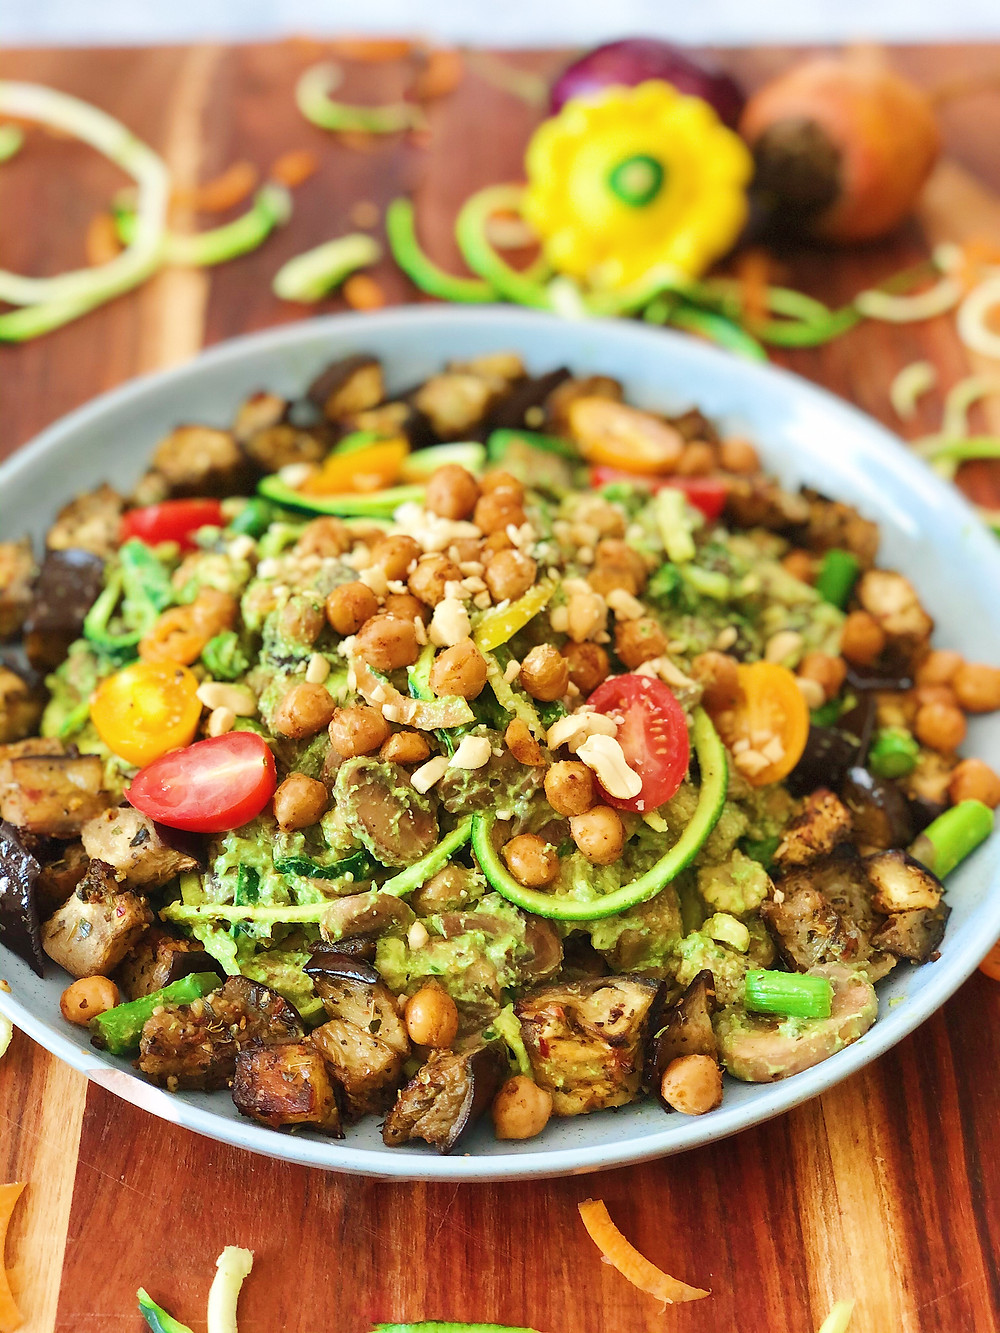 Vegan zoodle (zucchini noodles) with avocado pesto, eggplant, chickpeas and veggies